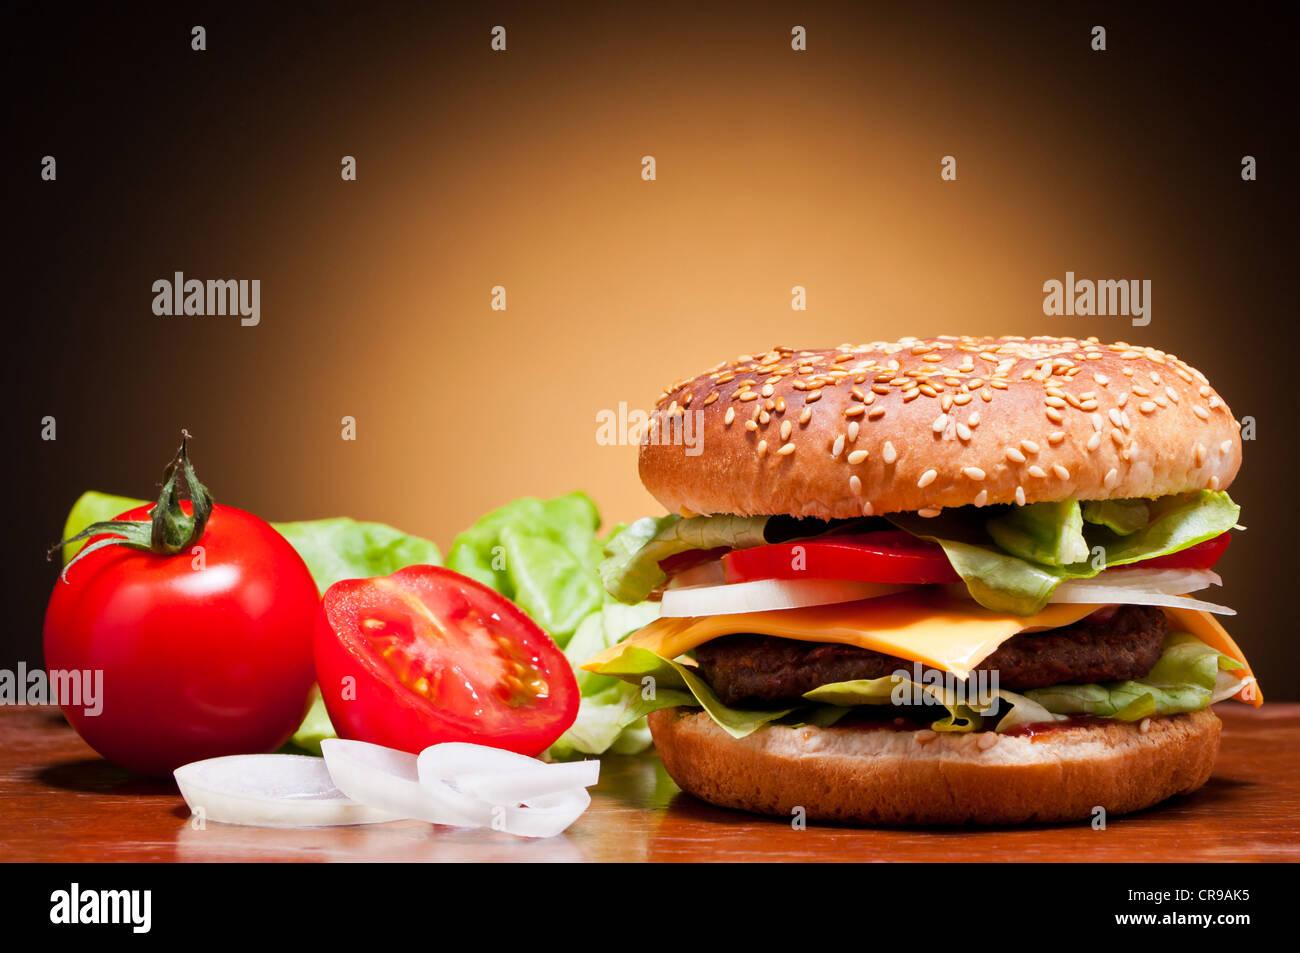 Hamburguesa tradicional y hortalizas bodegón Imagen De Stock